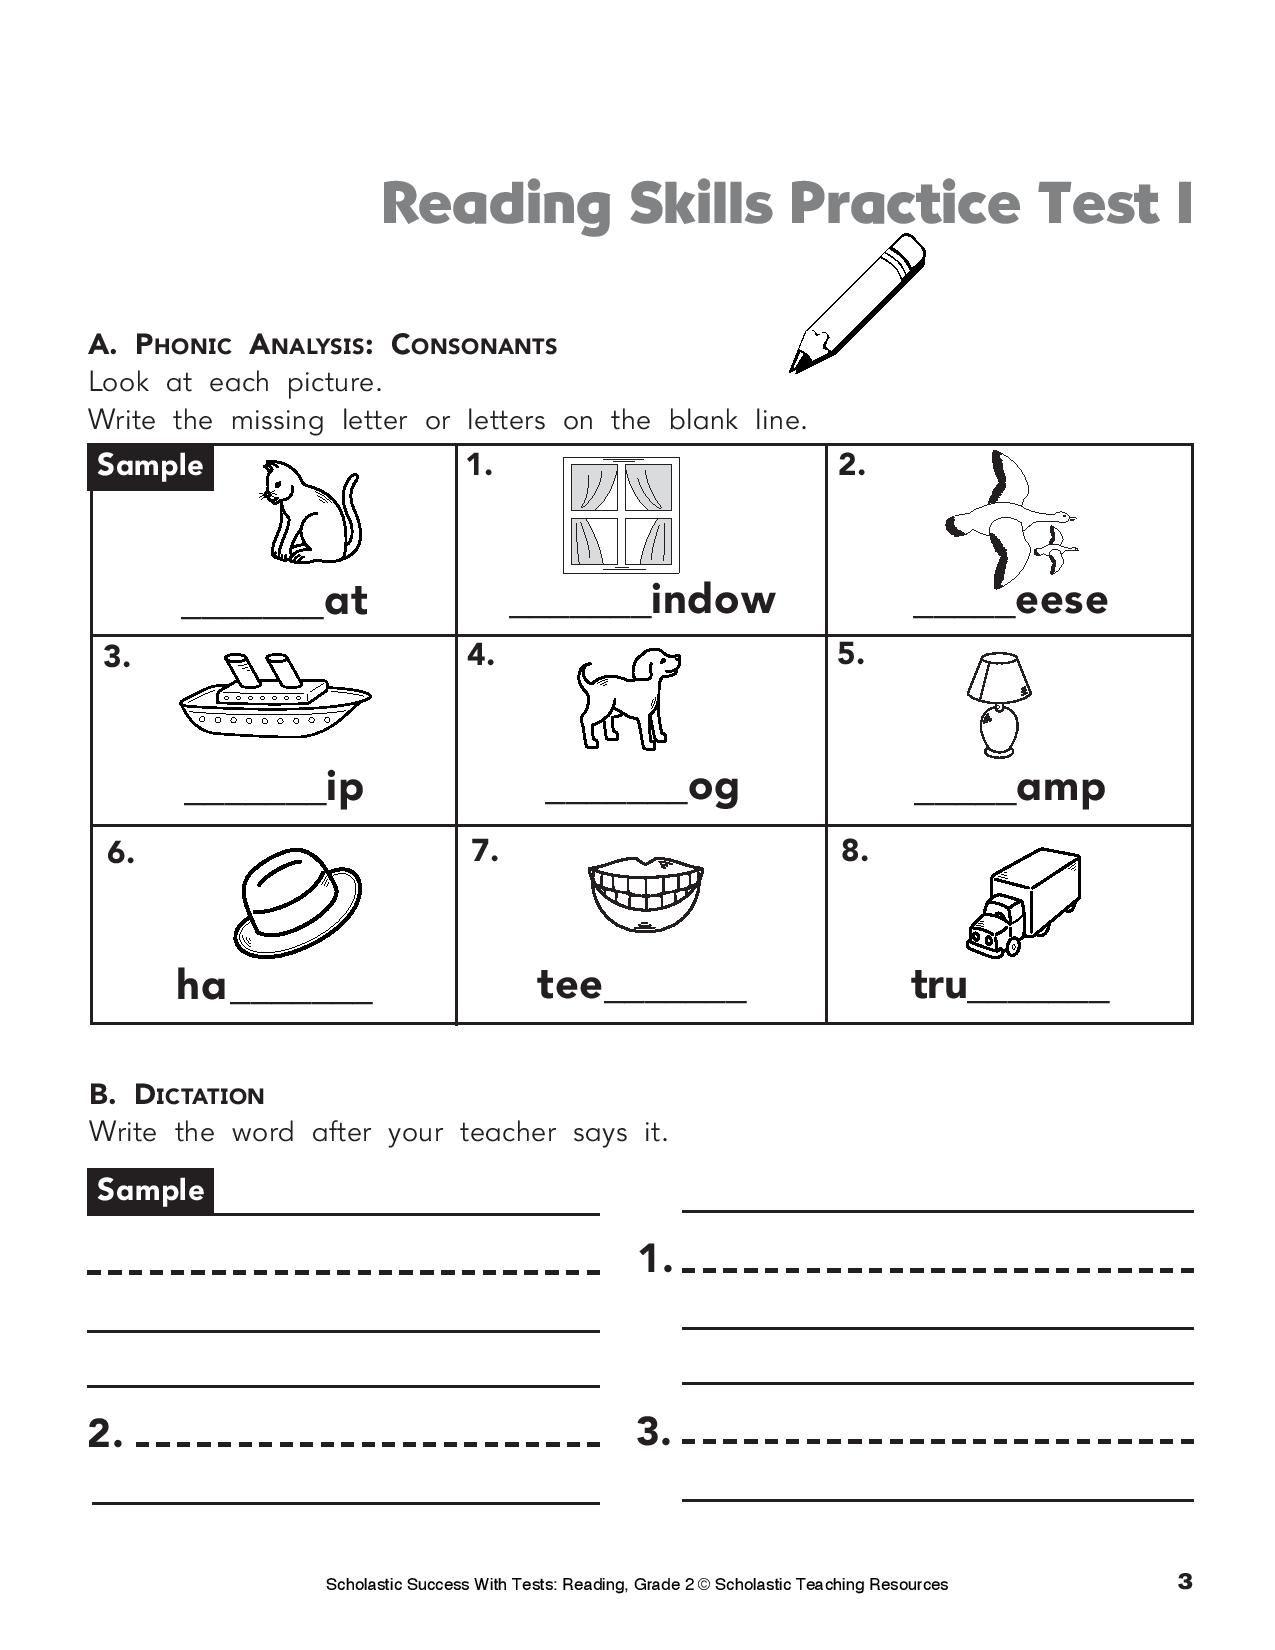 Hooked On Phonics Free Printable Worksheets | Free Printables | Hooked On Phonics Free Printable Worksheets